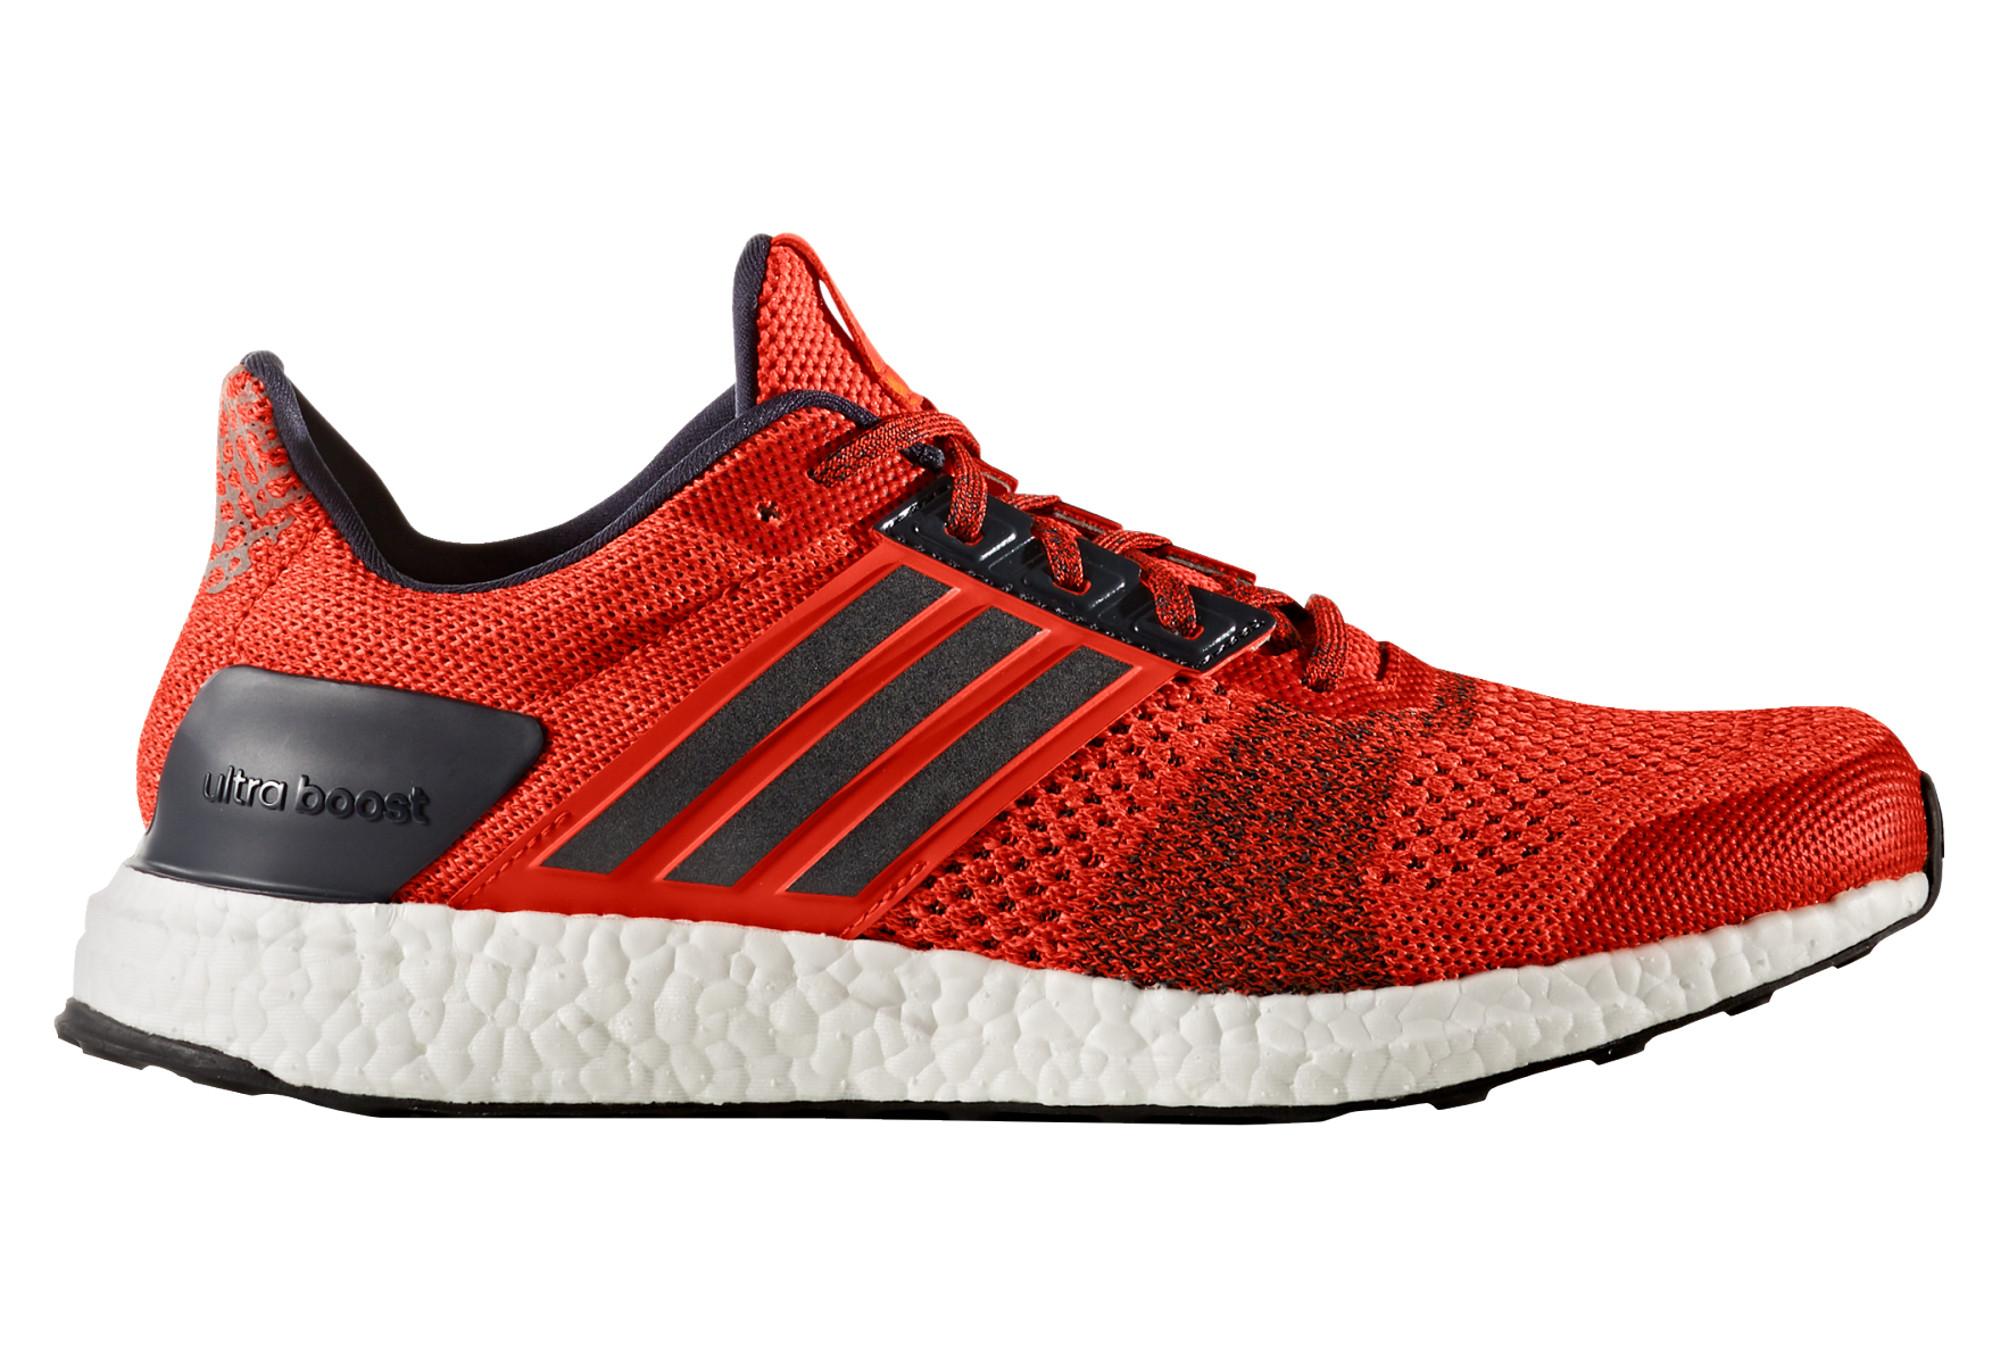 Boost St Orange Ultra Adidas Homme Running Kuc5TJ3Fl1